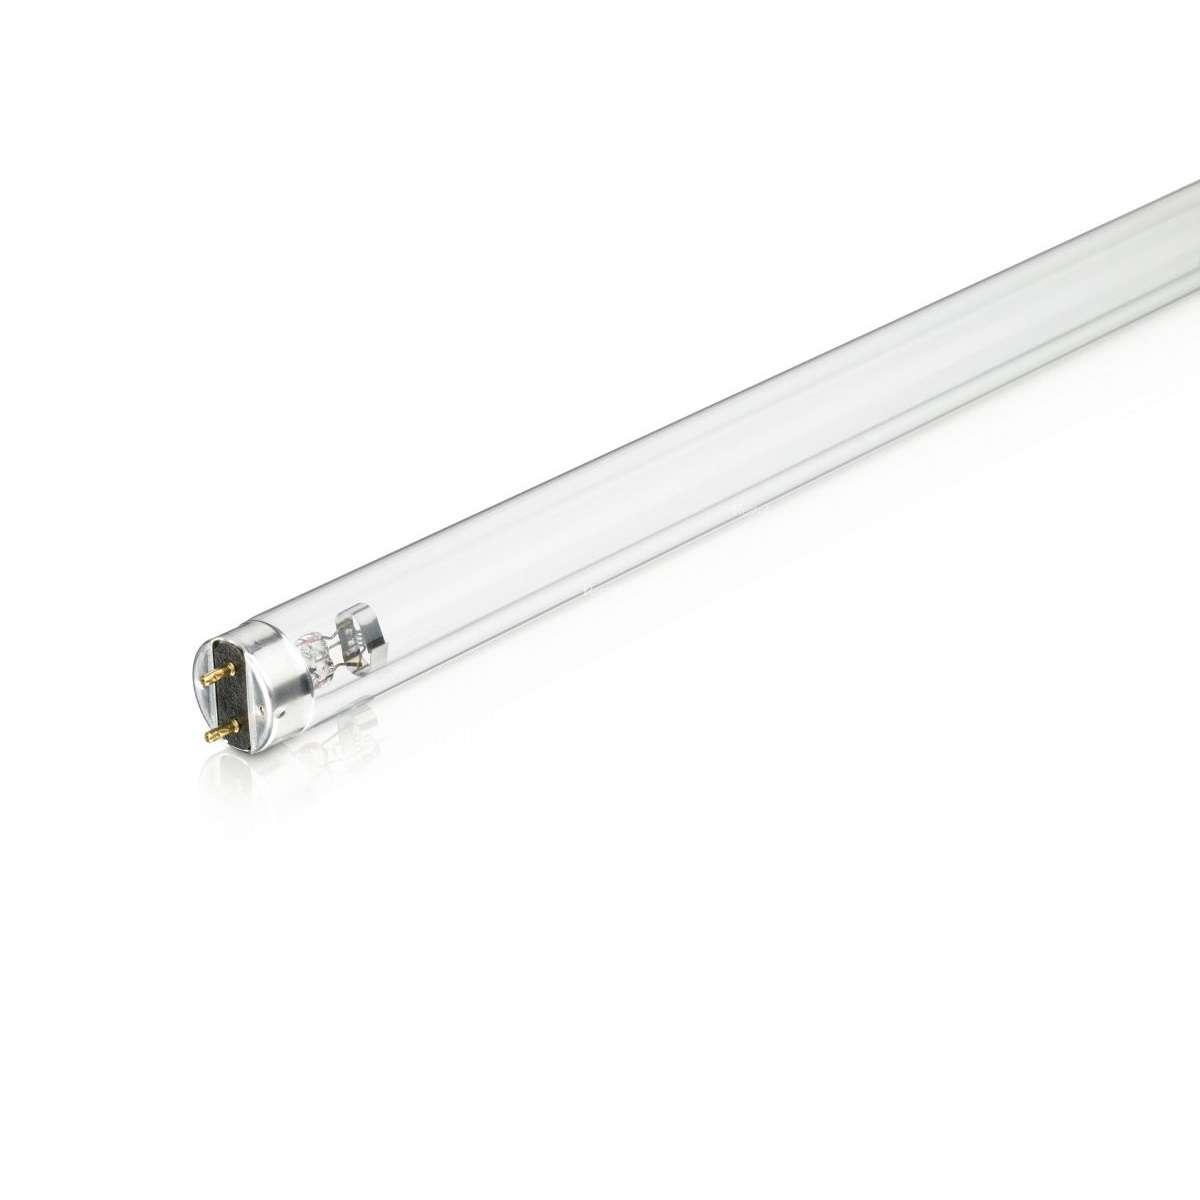 Лампа бактерицидная Ledvance TIBERA UVC T8 15W G13 арт. 4058075499201 безозоновая